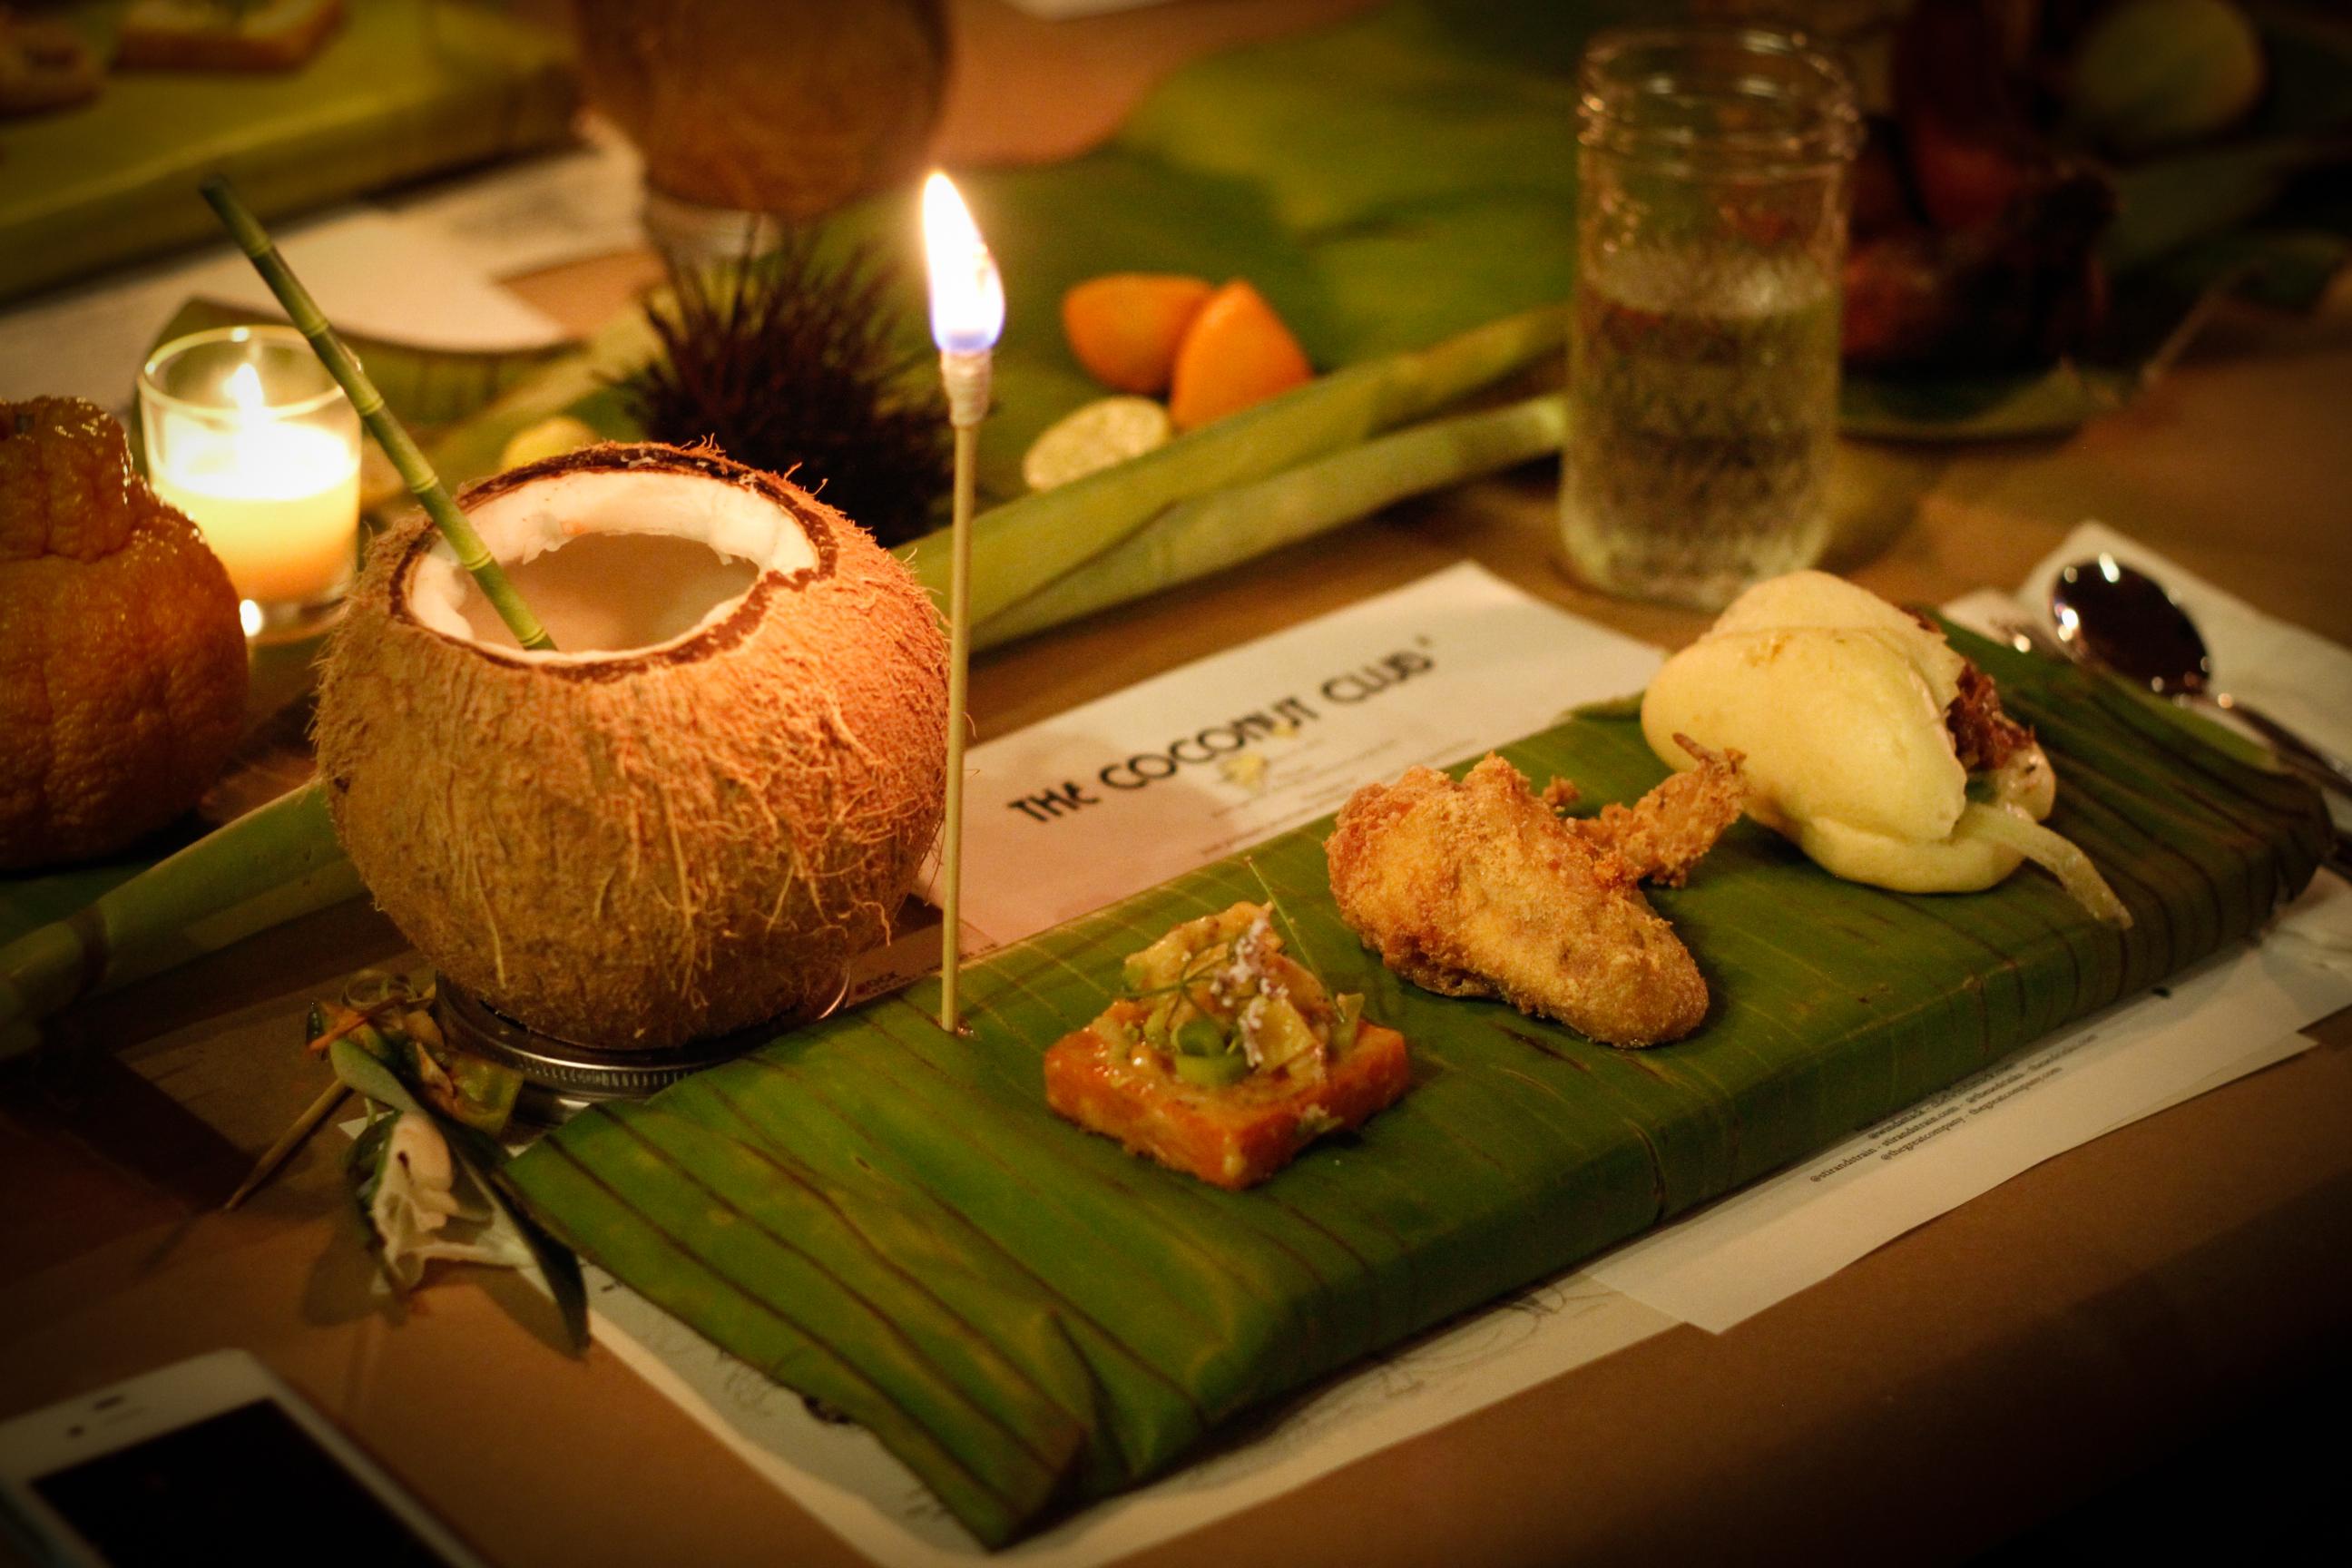 coconut yam, duck fat chicken wing, duck confit bao